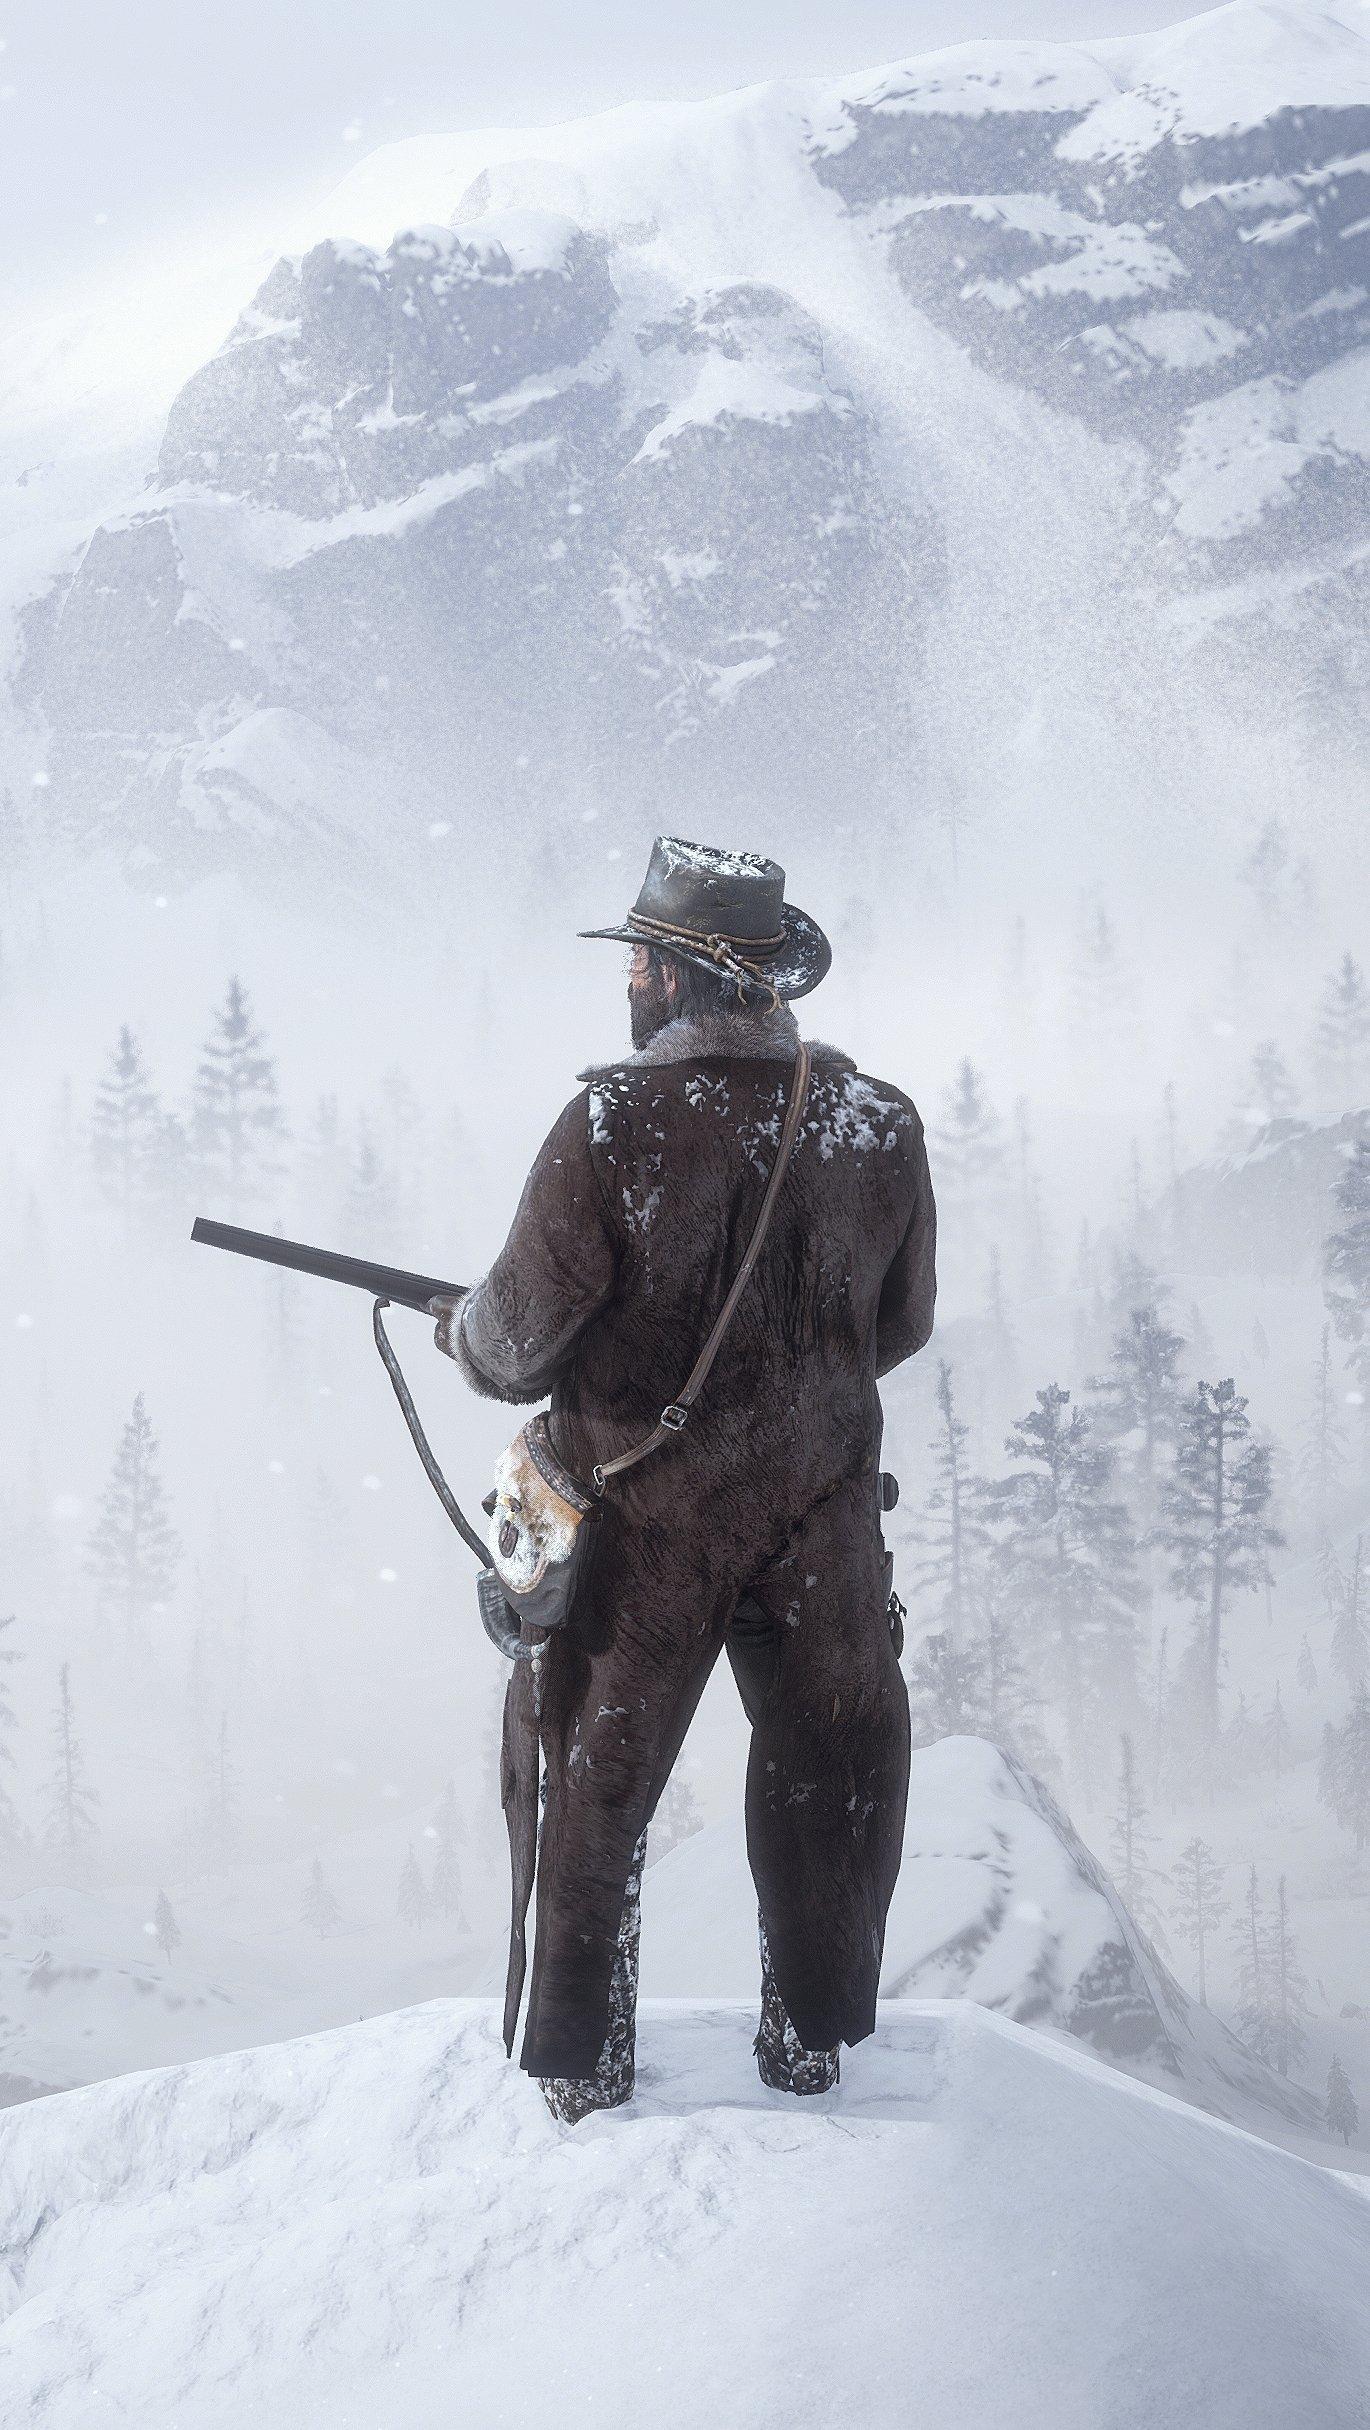 Fondos de pantalla Red Dead Redemption 2 The bounty hunter Vertical